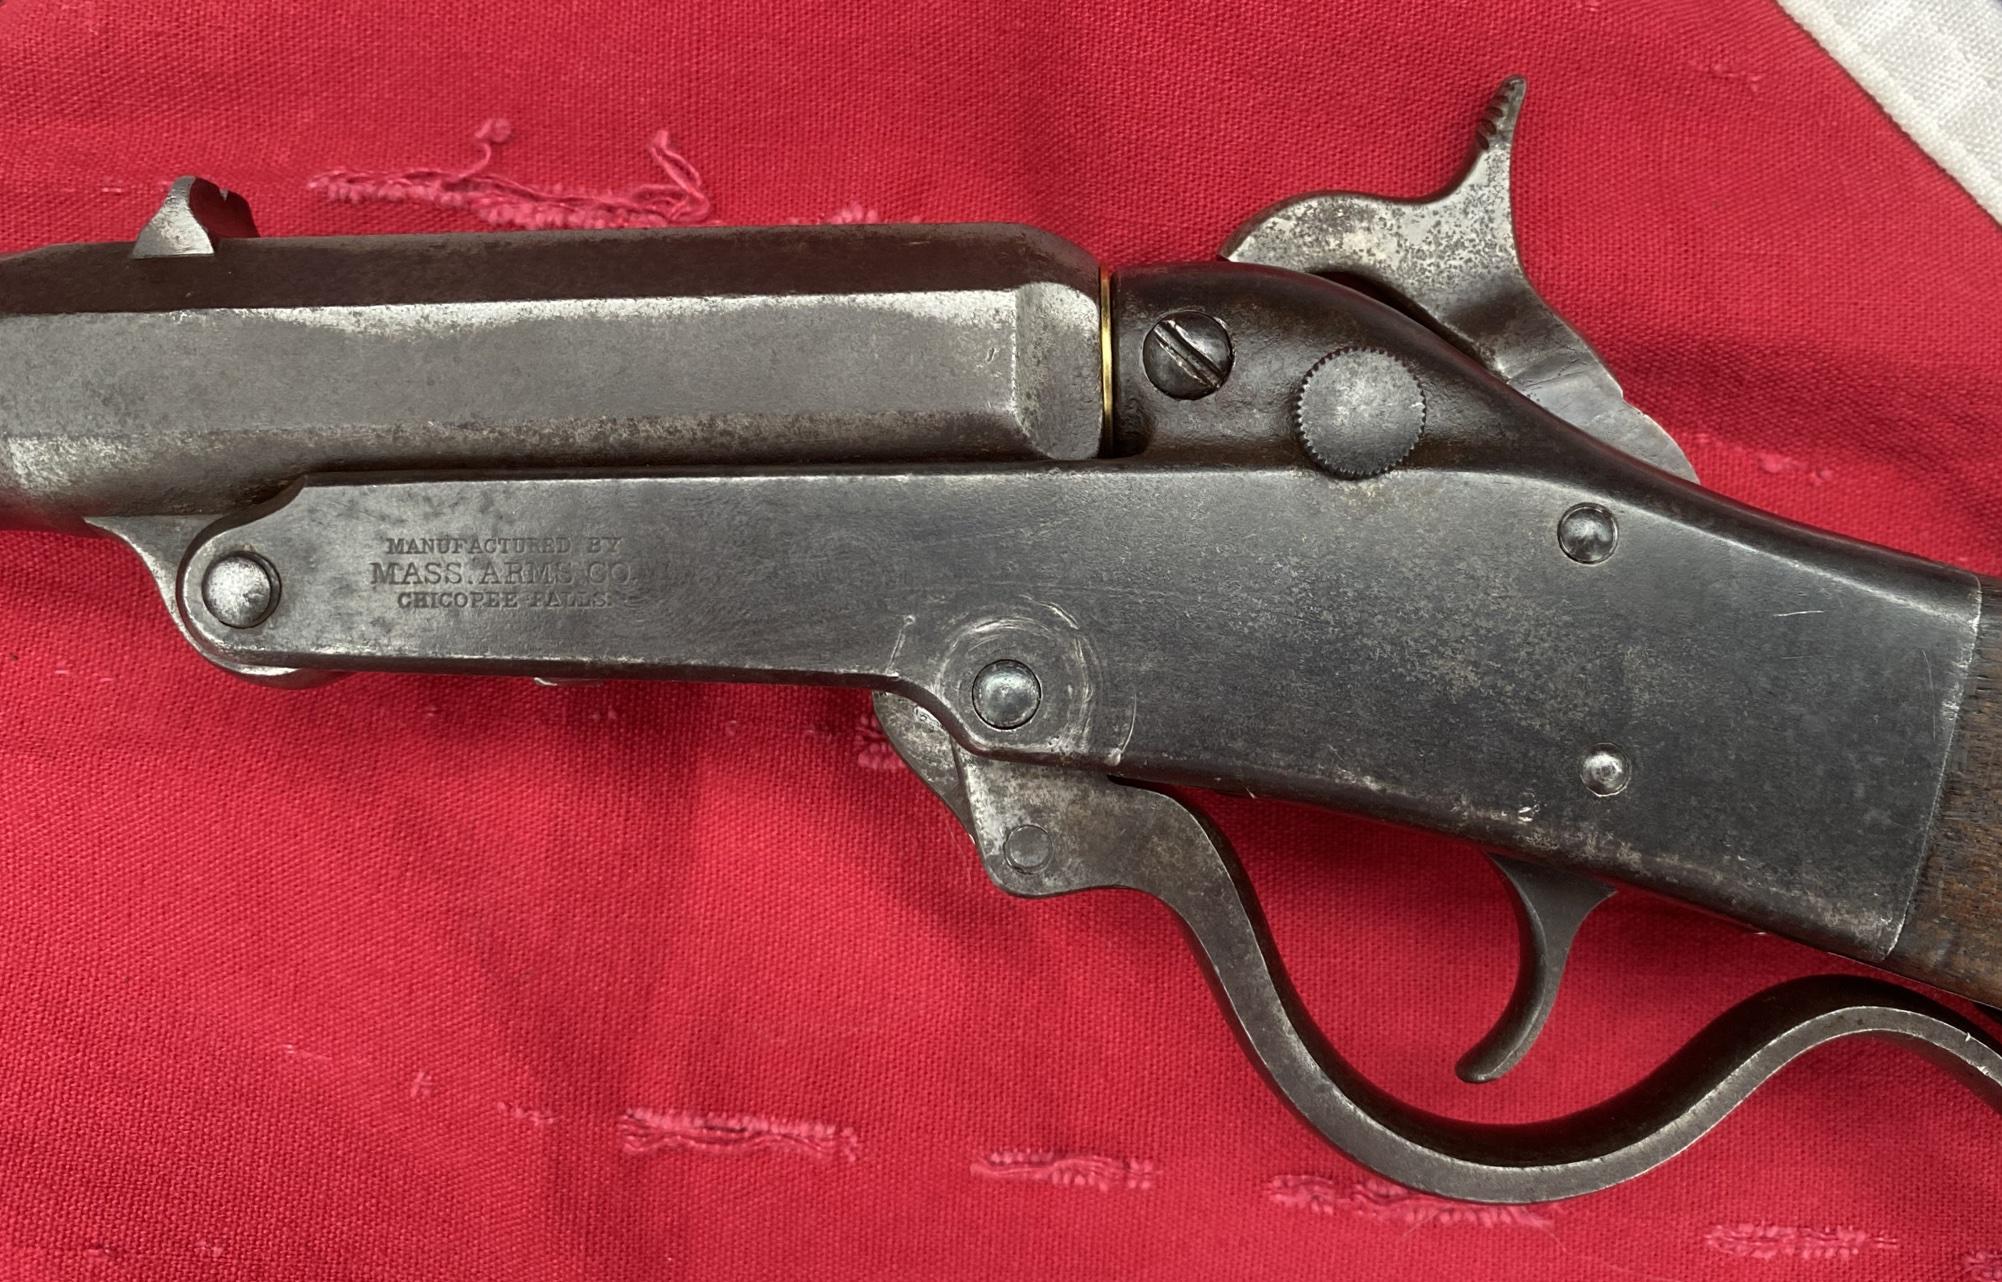 Maynard Carbine